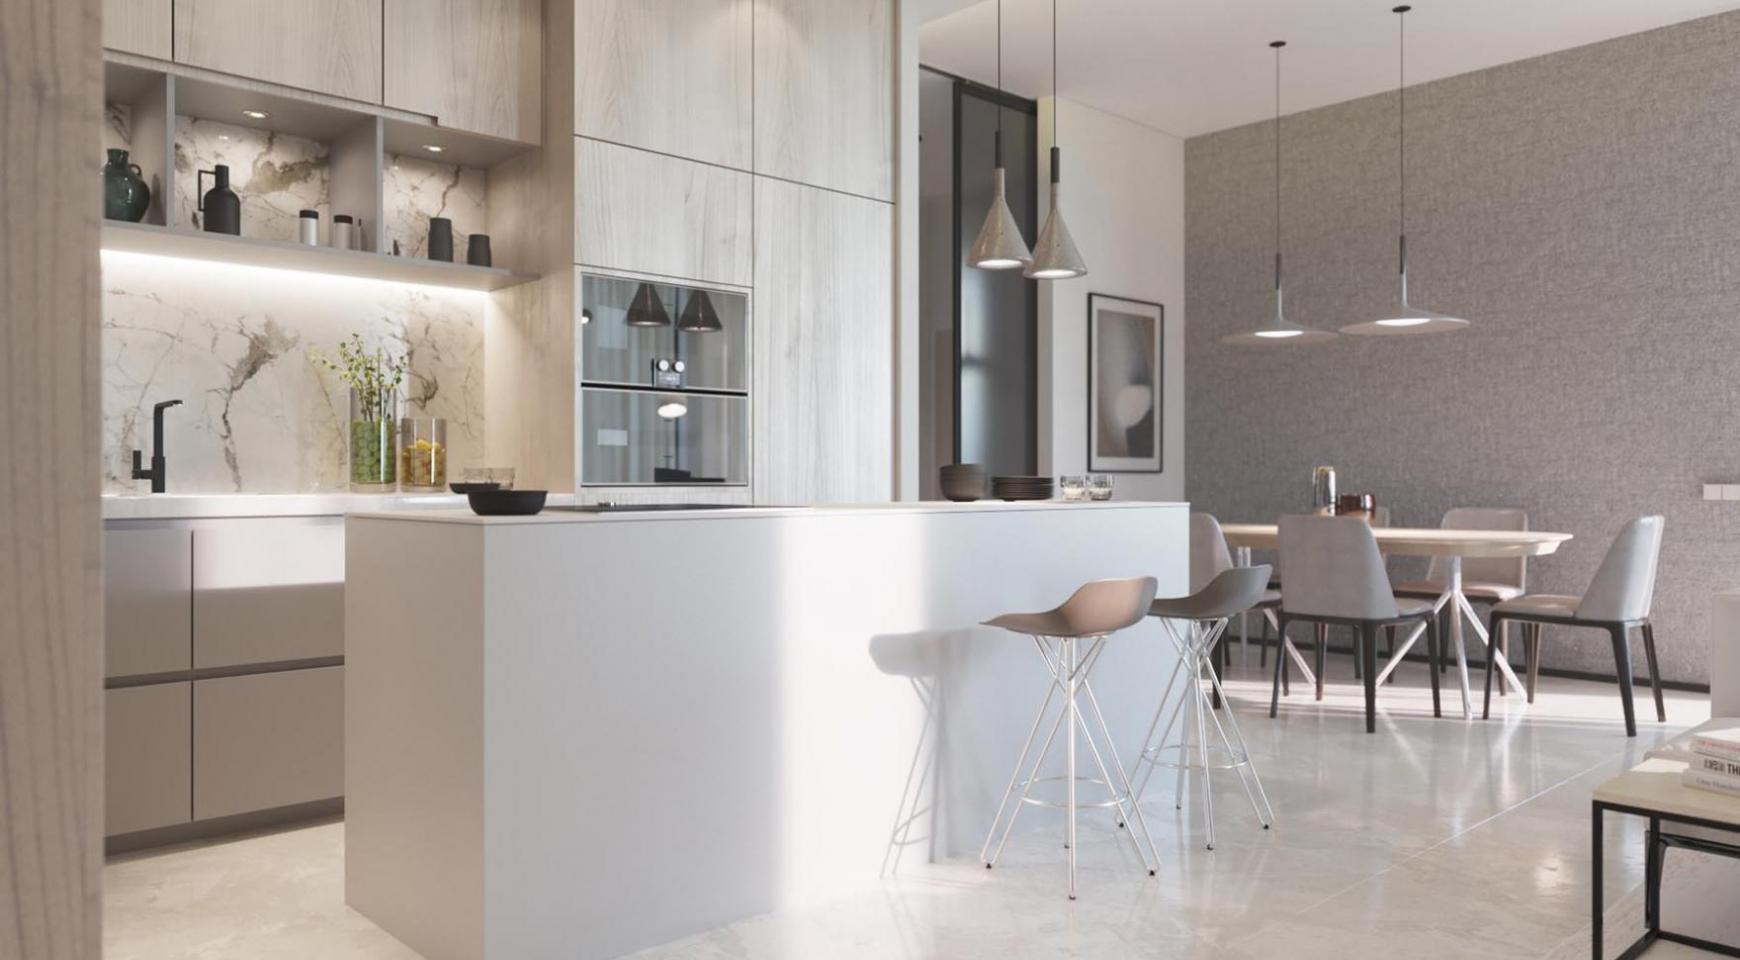 Contemporary 3 Bedroom Apartment in a New Complex near the Sea - 2